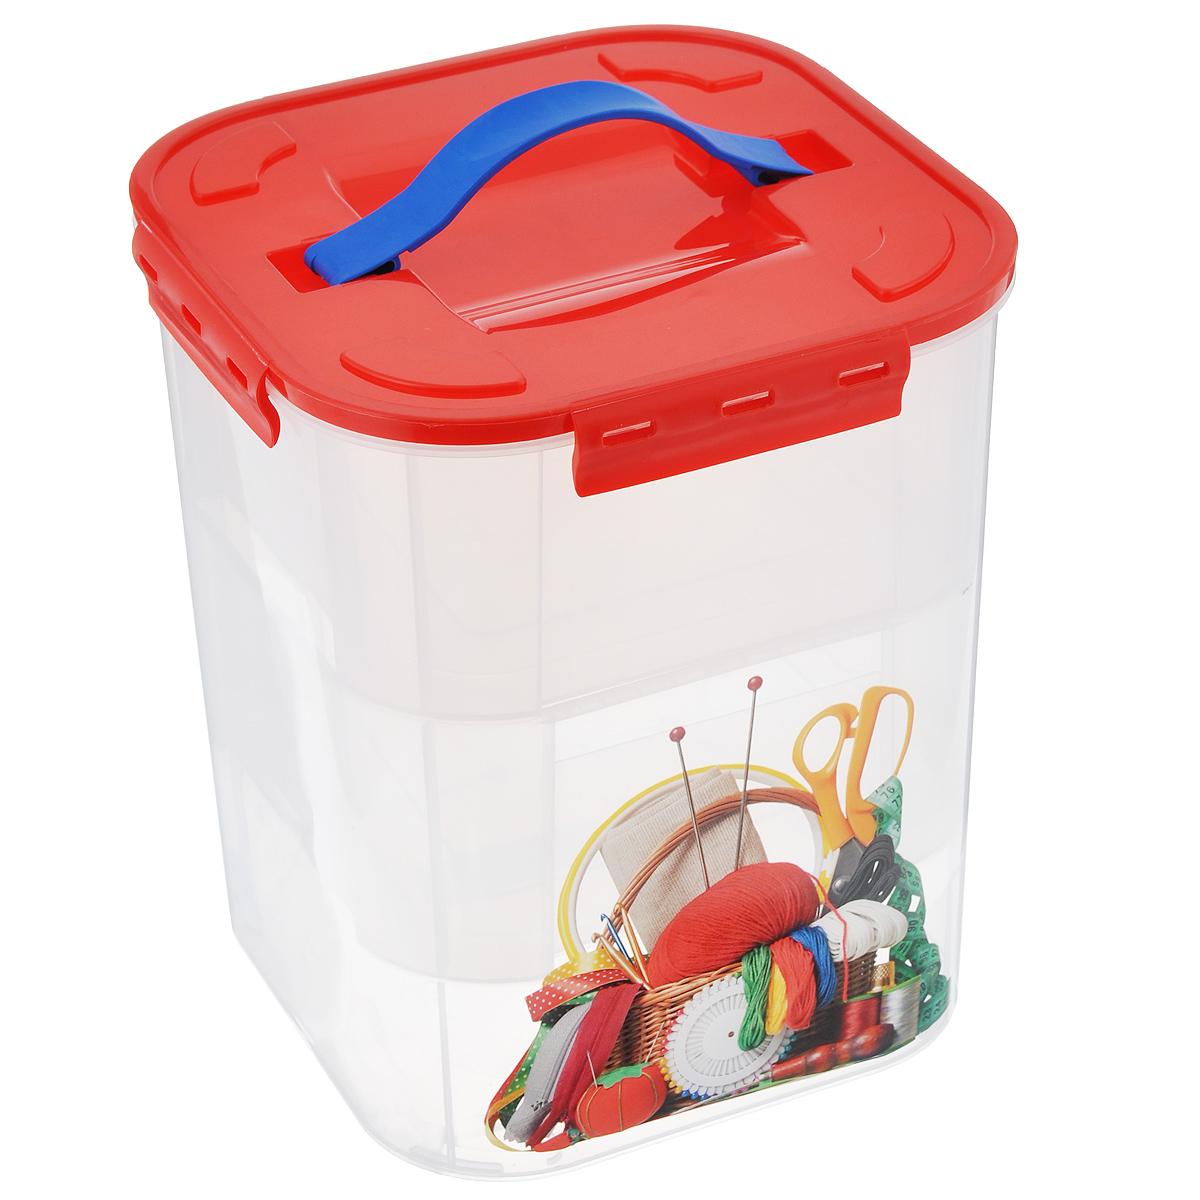 "Idea (М-пластика) Контейнер для хранения Idea ""Деко. Рукоделие"", с 2 вкладышами, 10 л М 2831_Рукоделие"